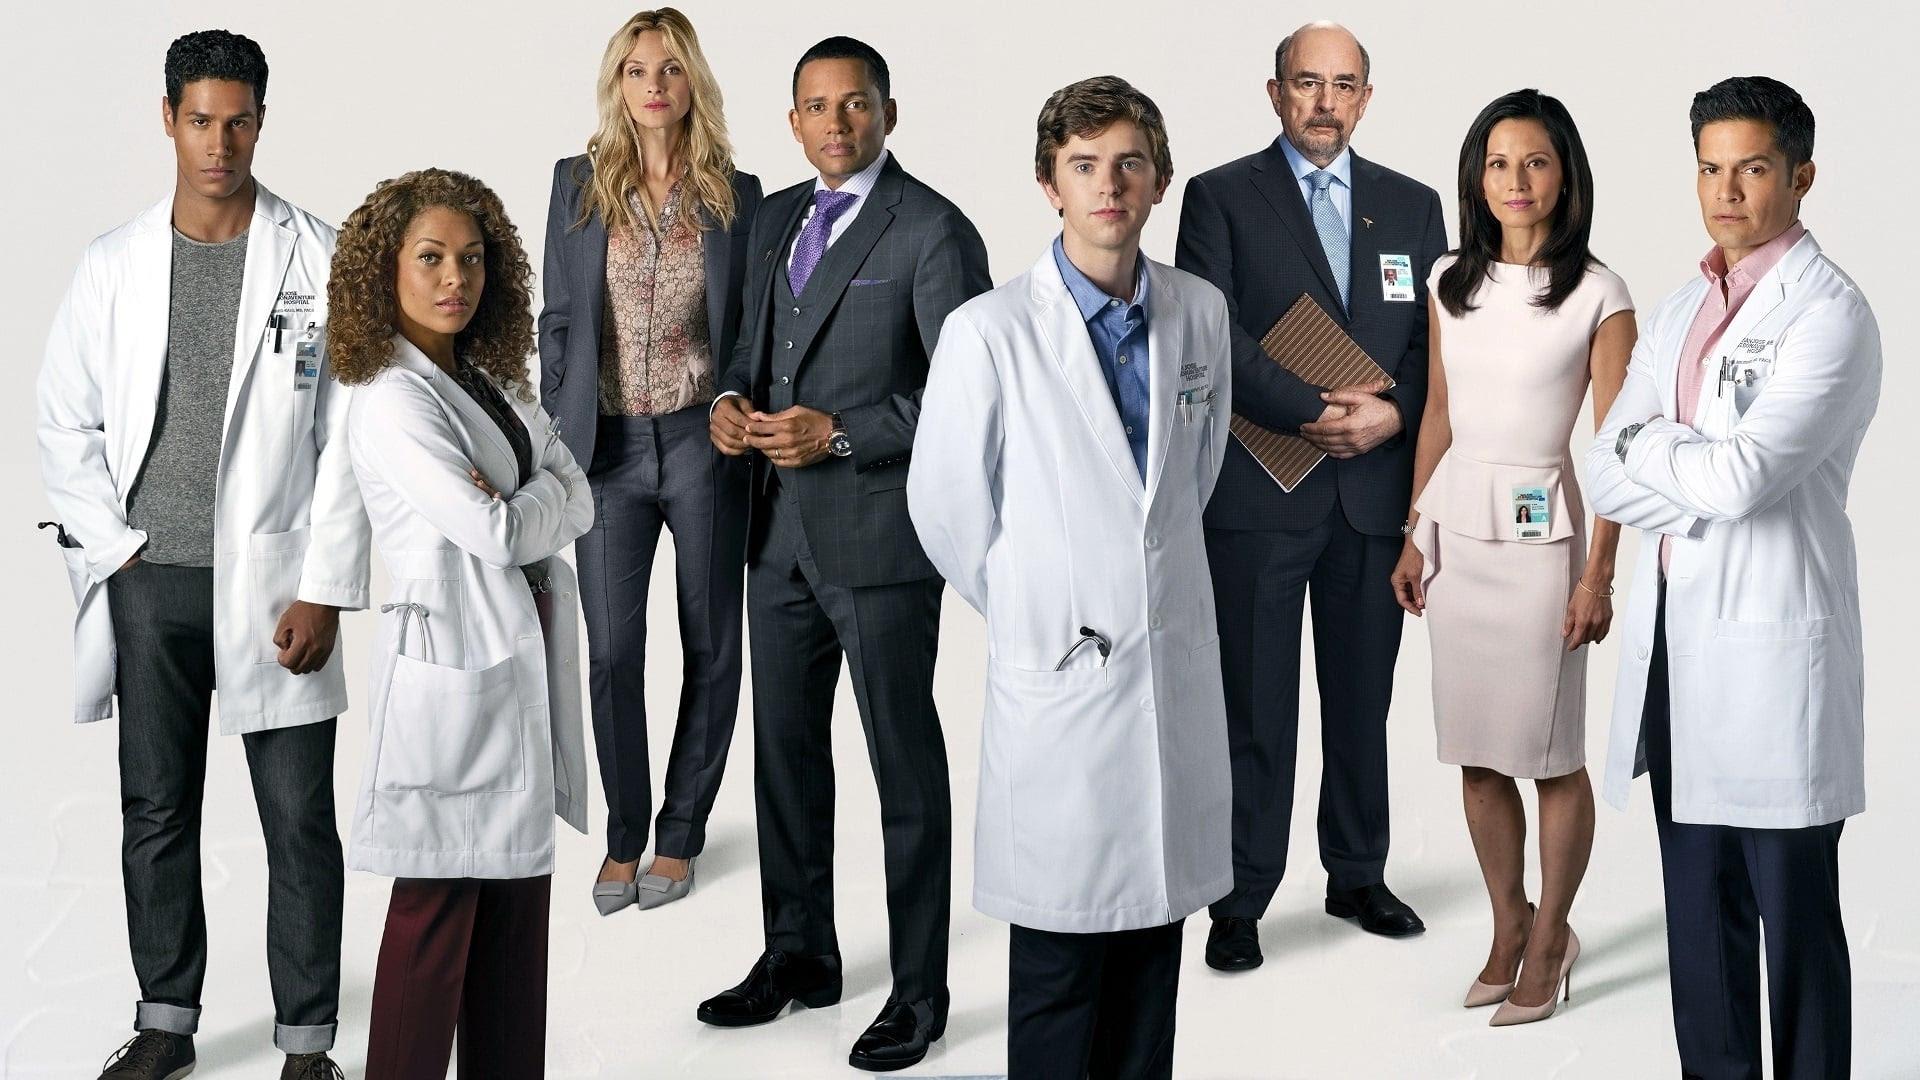 The Good Doctor S4E20